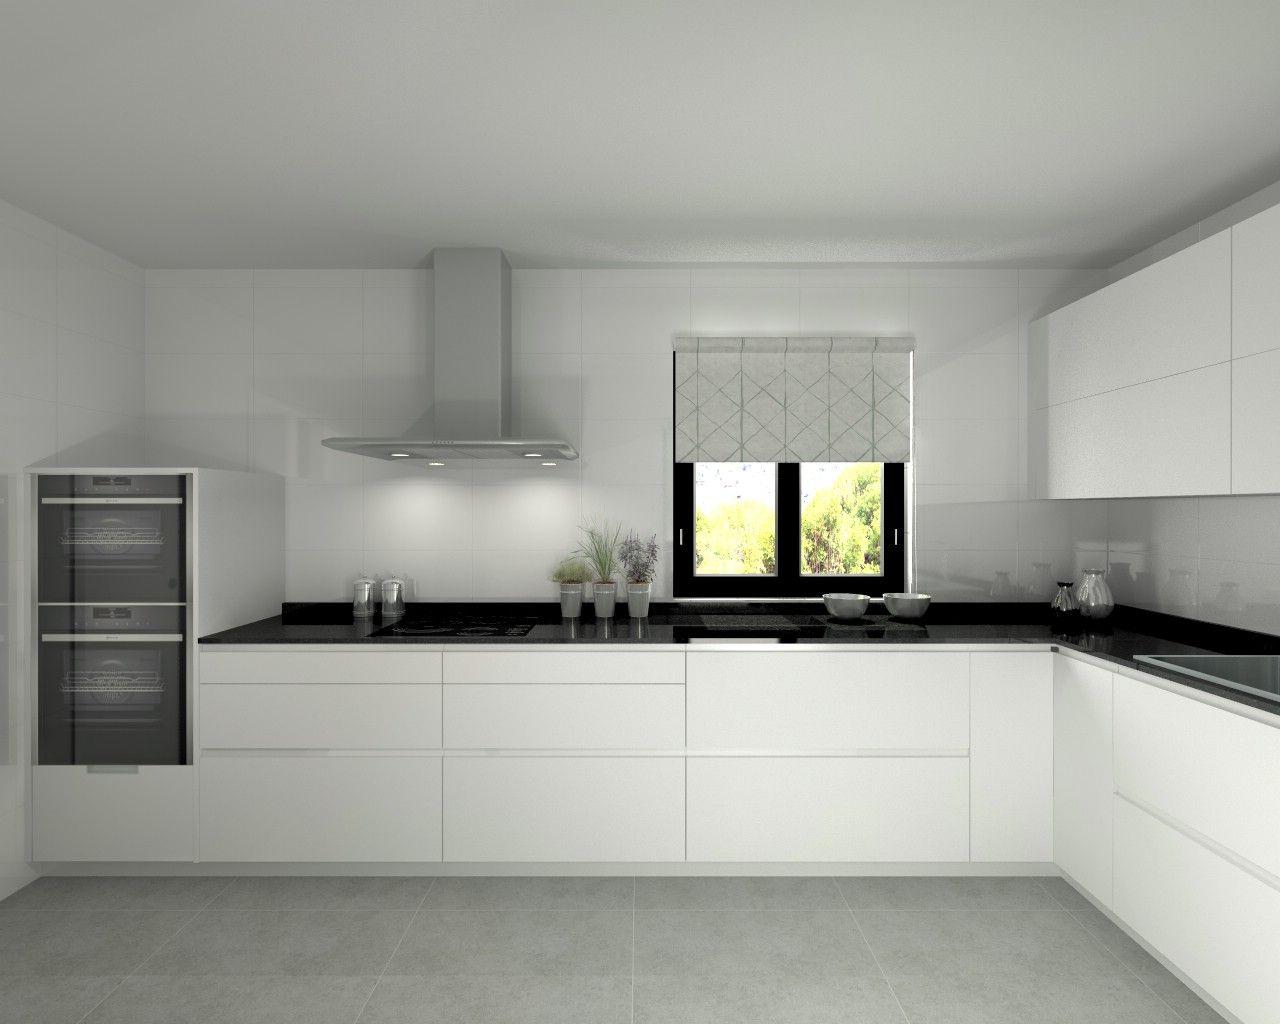 Modelo line l blanco seda encimera granito negro for Encimera cocina granito